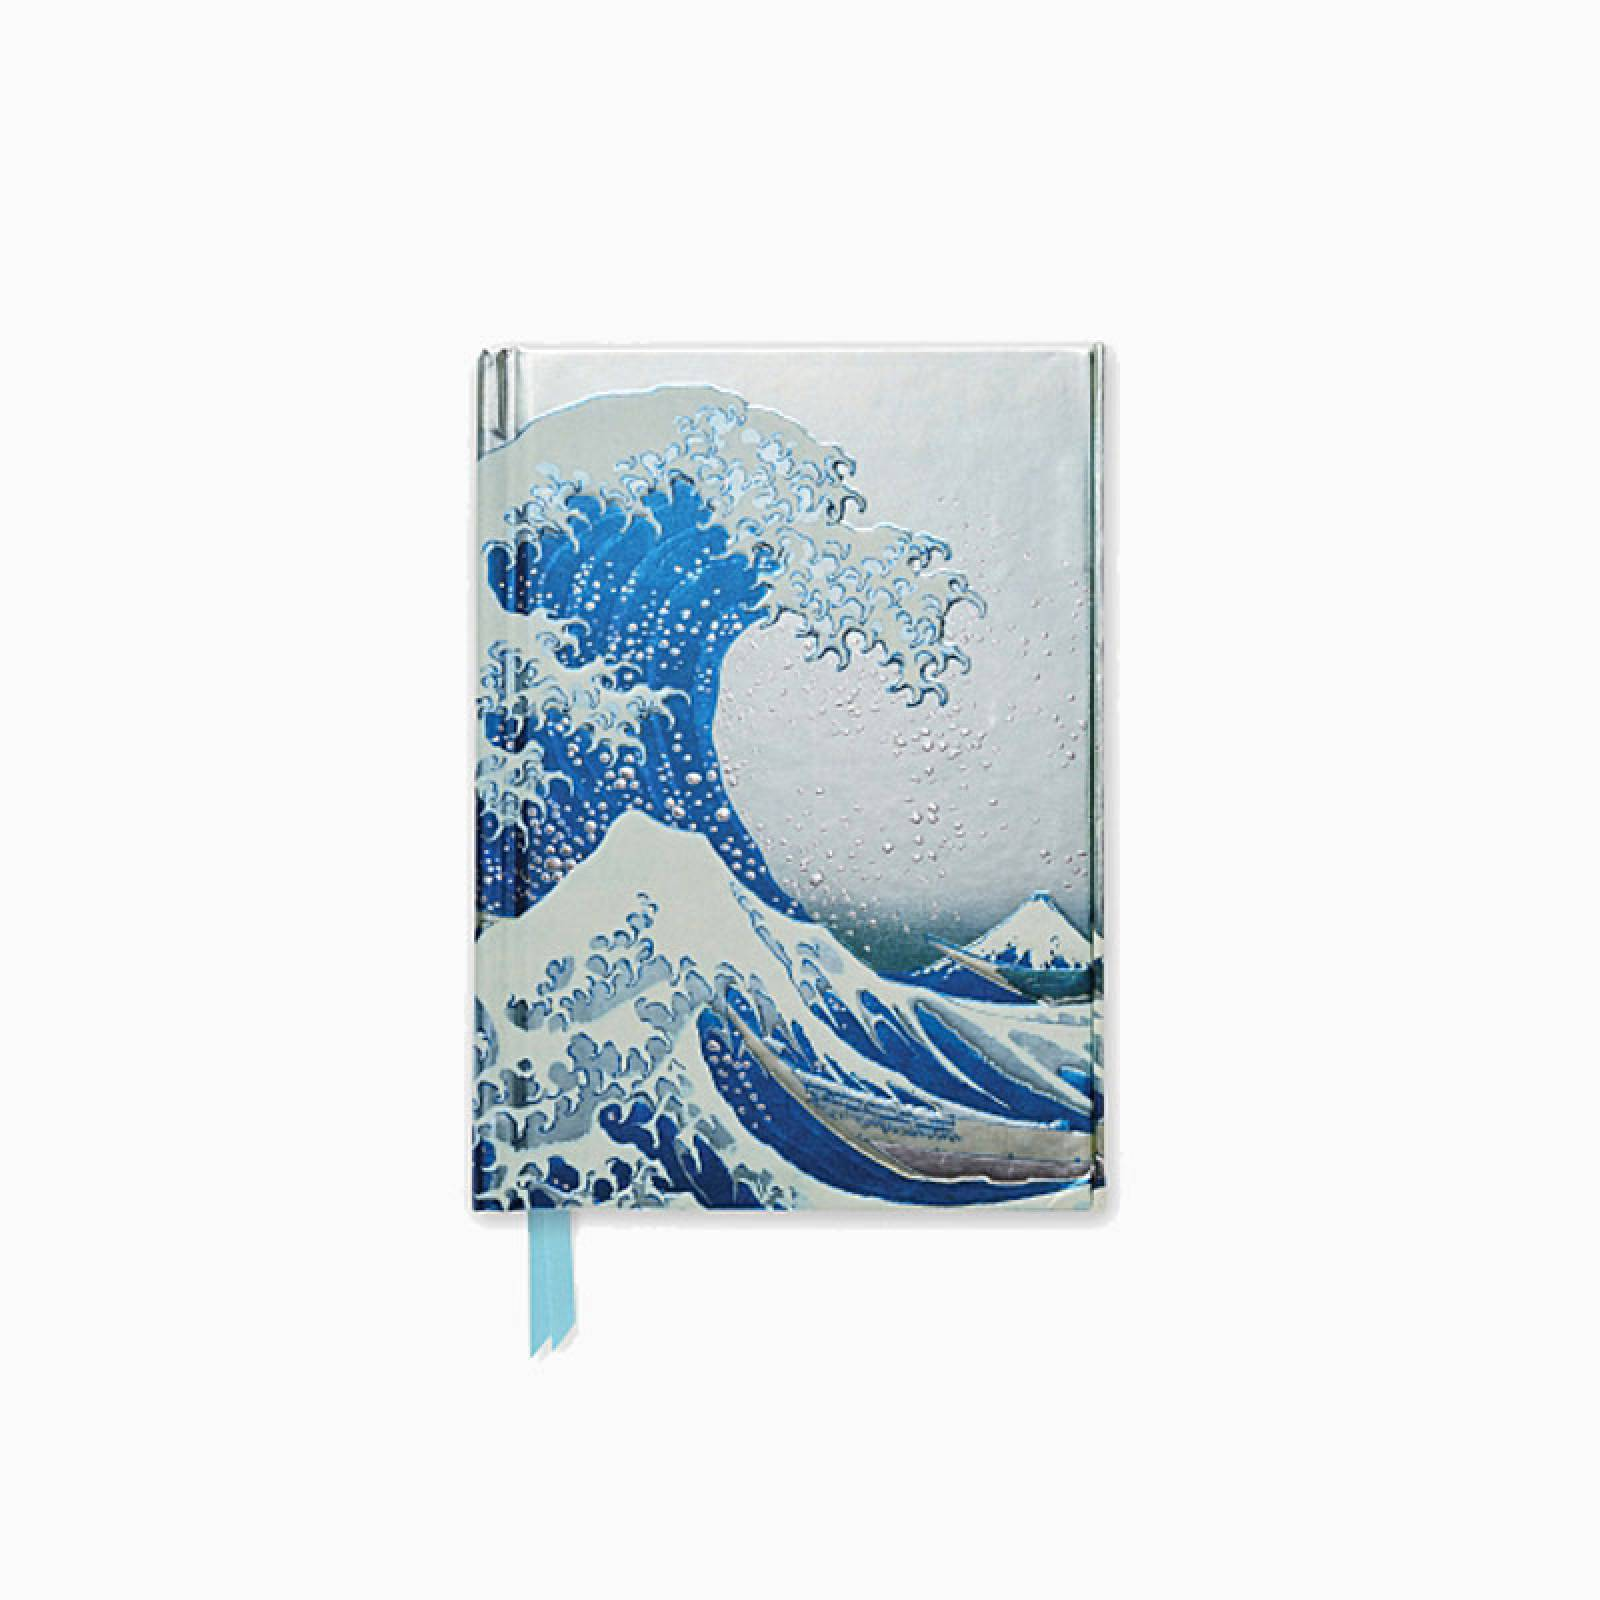 Hokusai The Great Wave - Foiled Pocket Journal